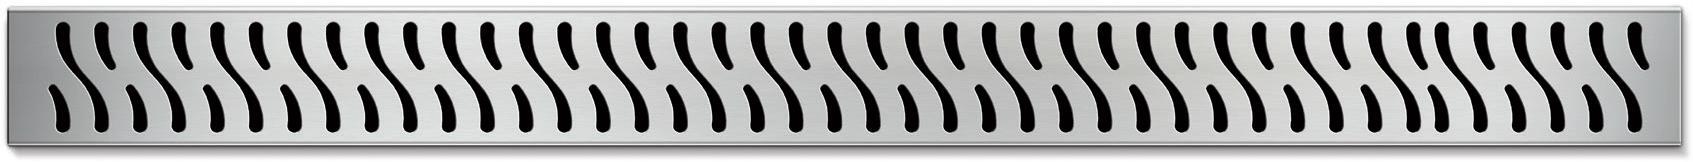 Водоотводящие желоба для монтажа к стене - harmony-reshetka-glyanets - miroslav-chudej-s-r-o - 350-x-415 - 1-2 - 1 - 200 - czech-republic